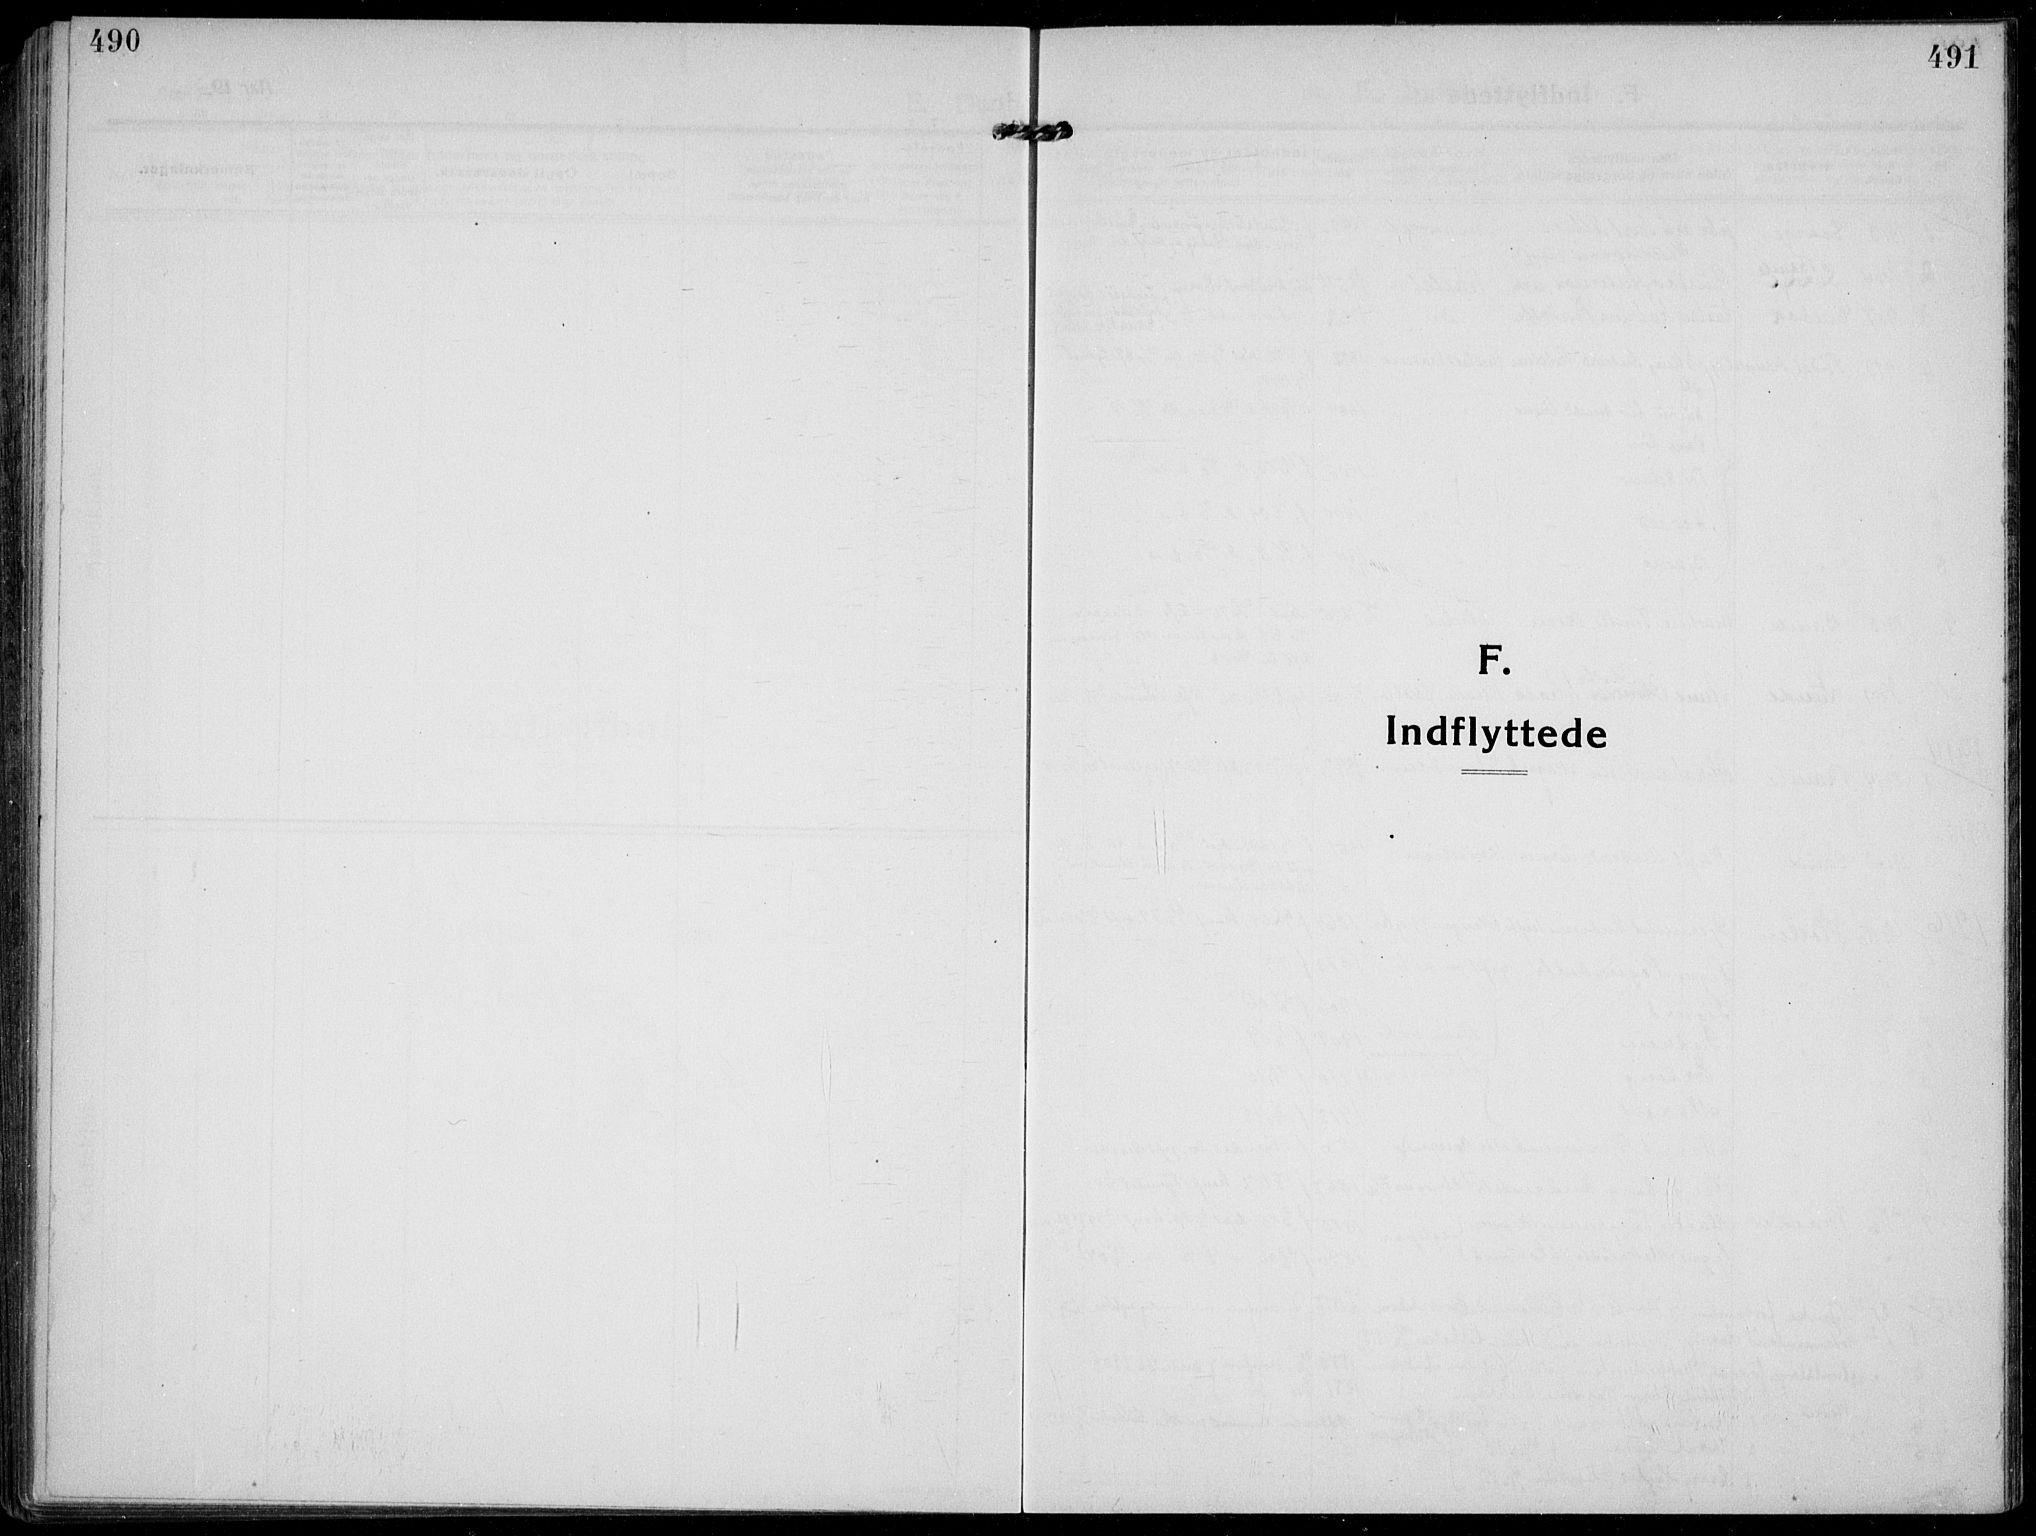 SAKO, Solum kirkebøker, F/Fb/L0004: Ministerialbok nr. II 4, 1913-1924, s. 490-491